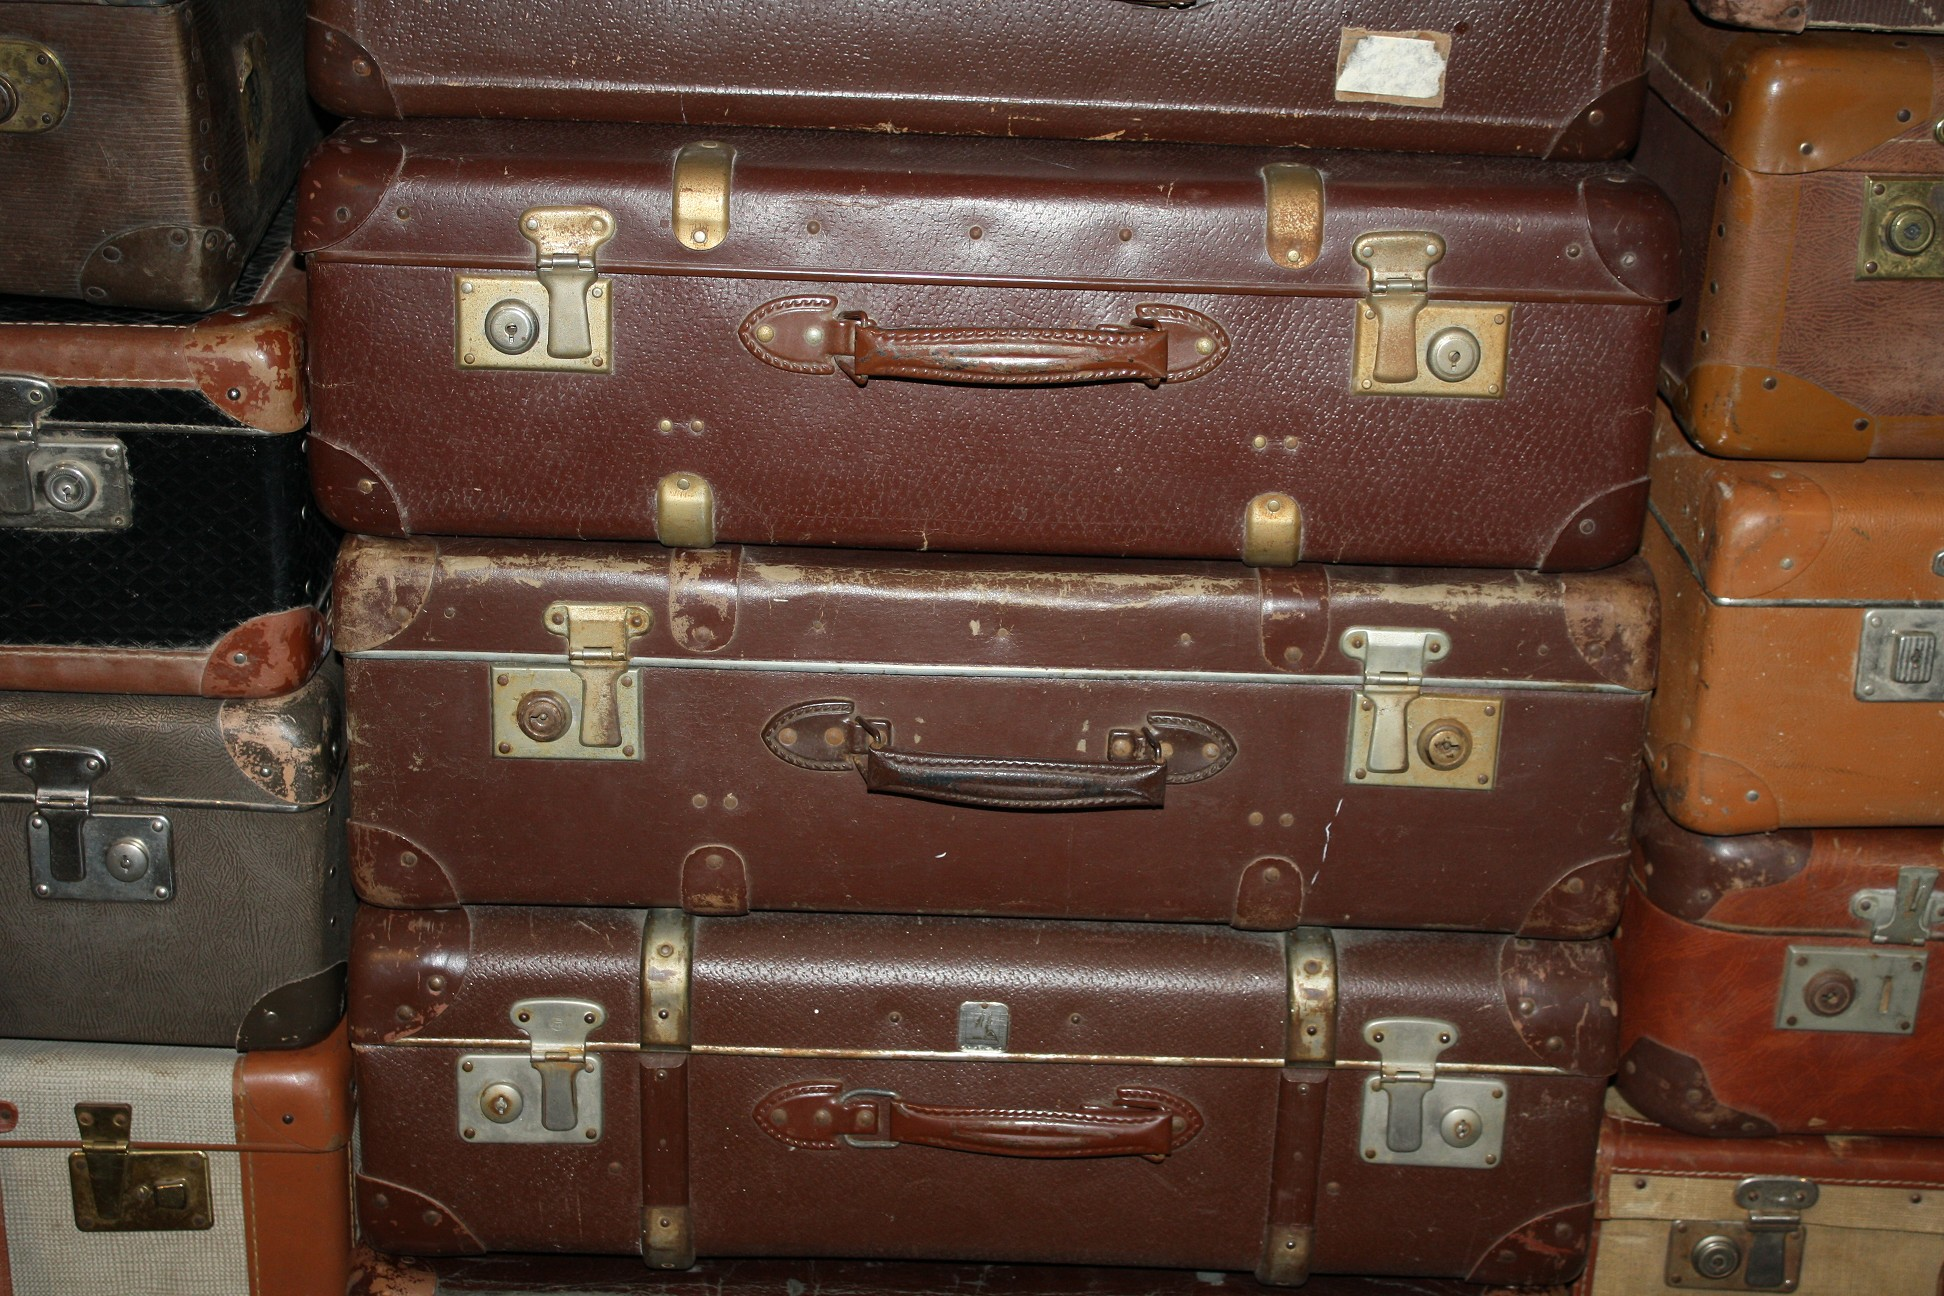 10 st ck antike koffer konvolut von jahrhundertwende bis. Black Bedroom Furniture Sets. Home Design Ideas